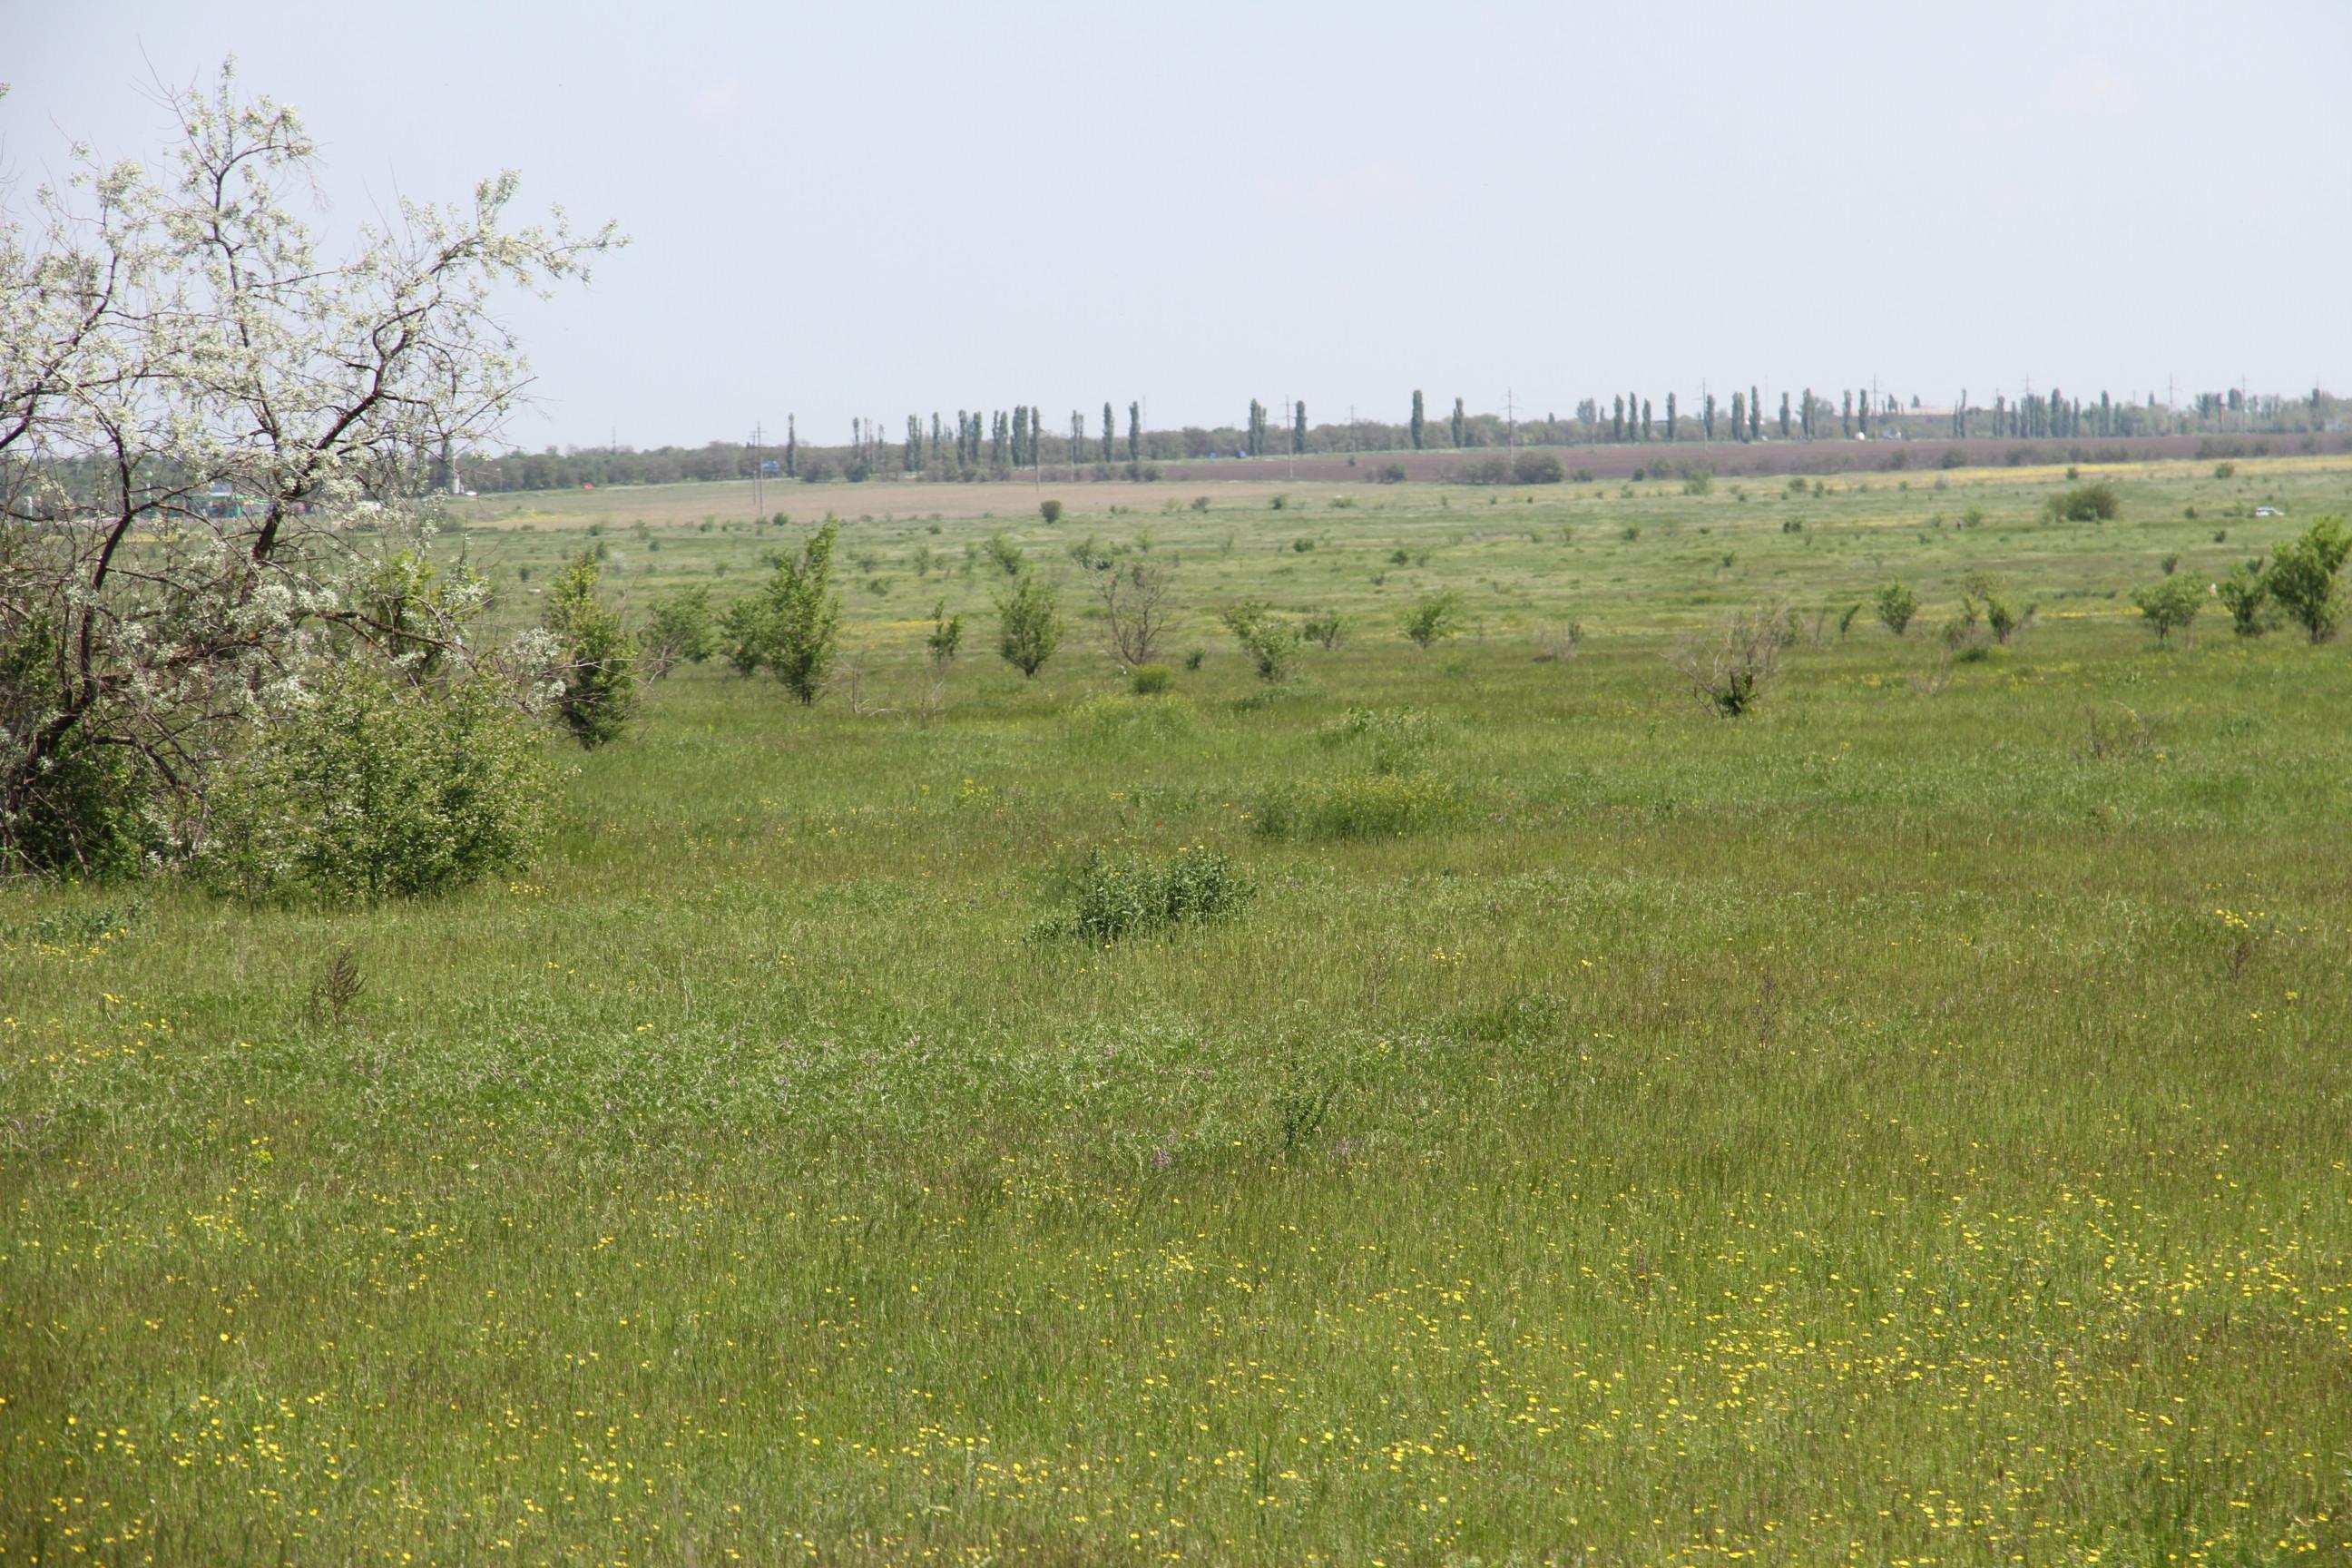 В Николаеве появится новое кладбище за Херсонским шоссе (ФОТО) (фото) - фото 5